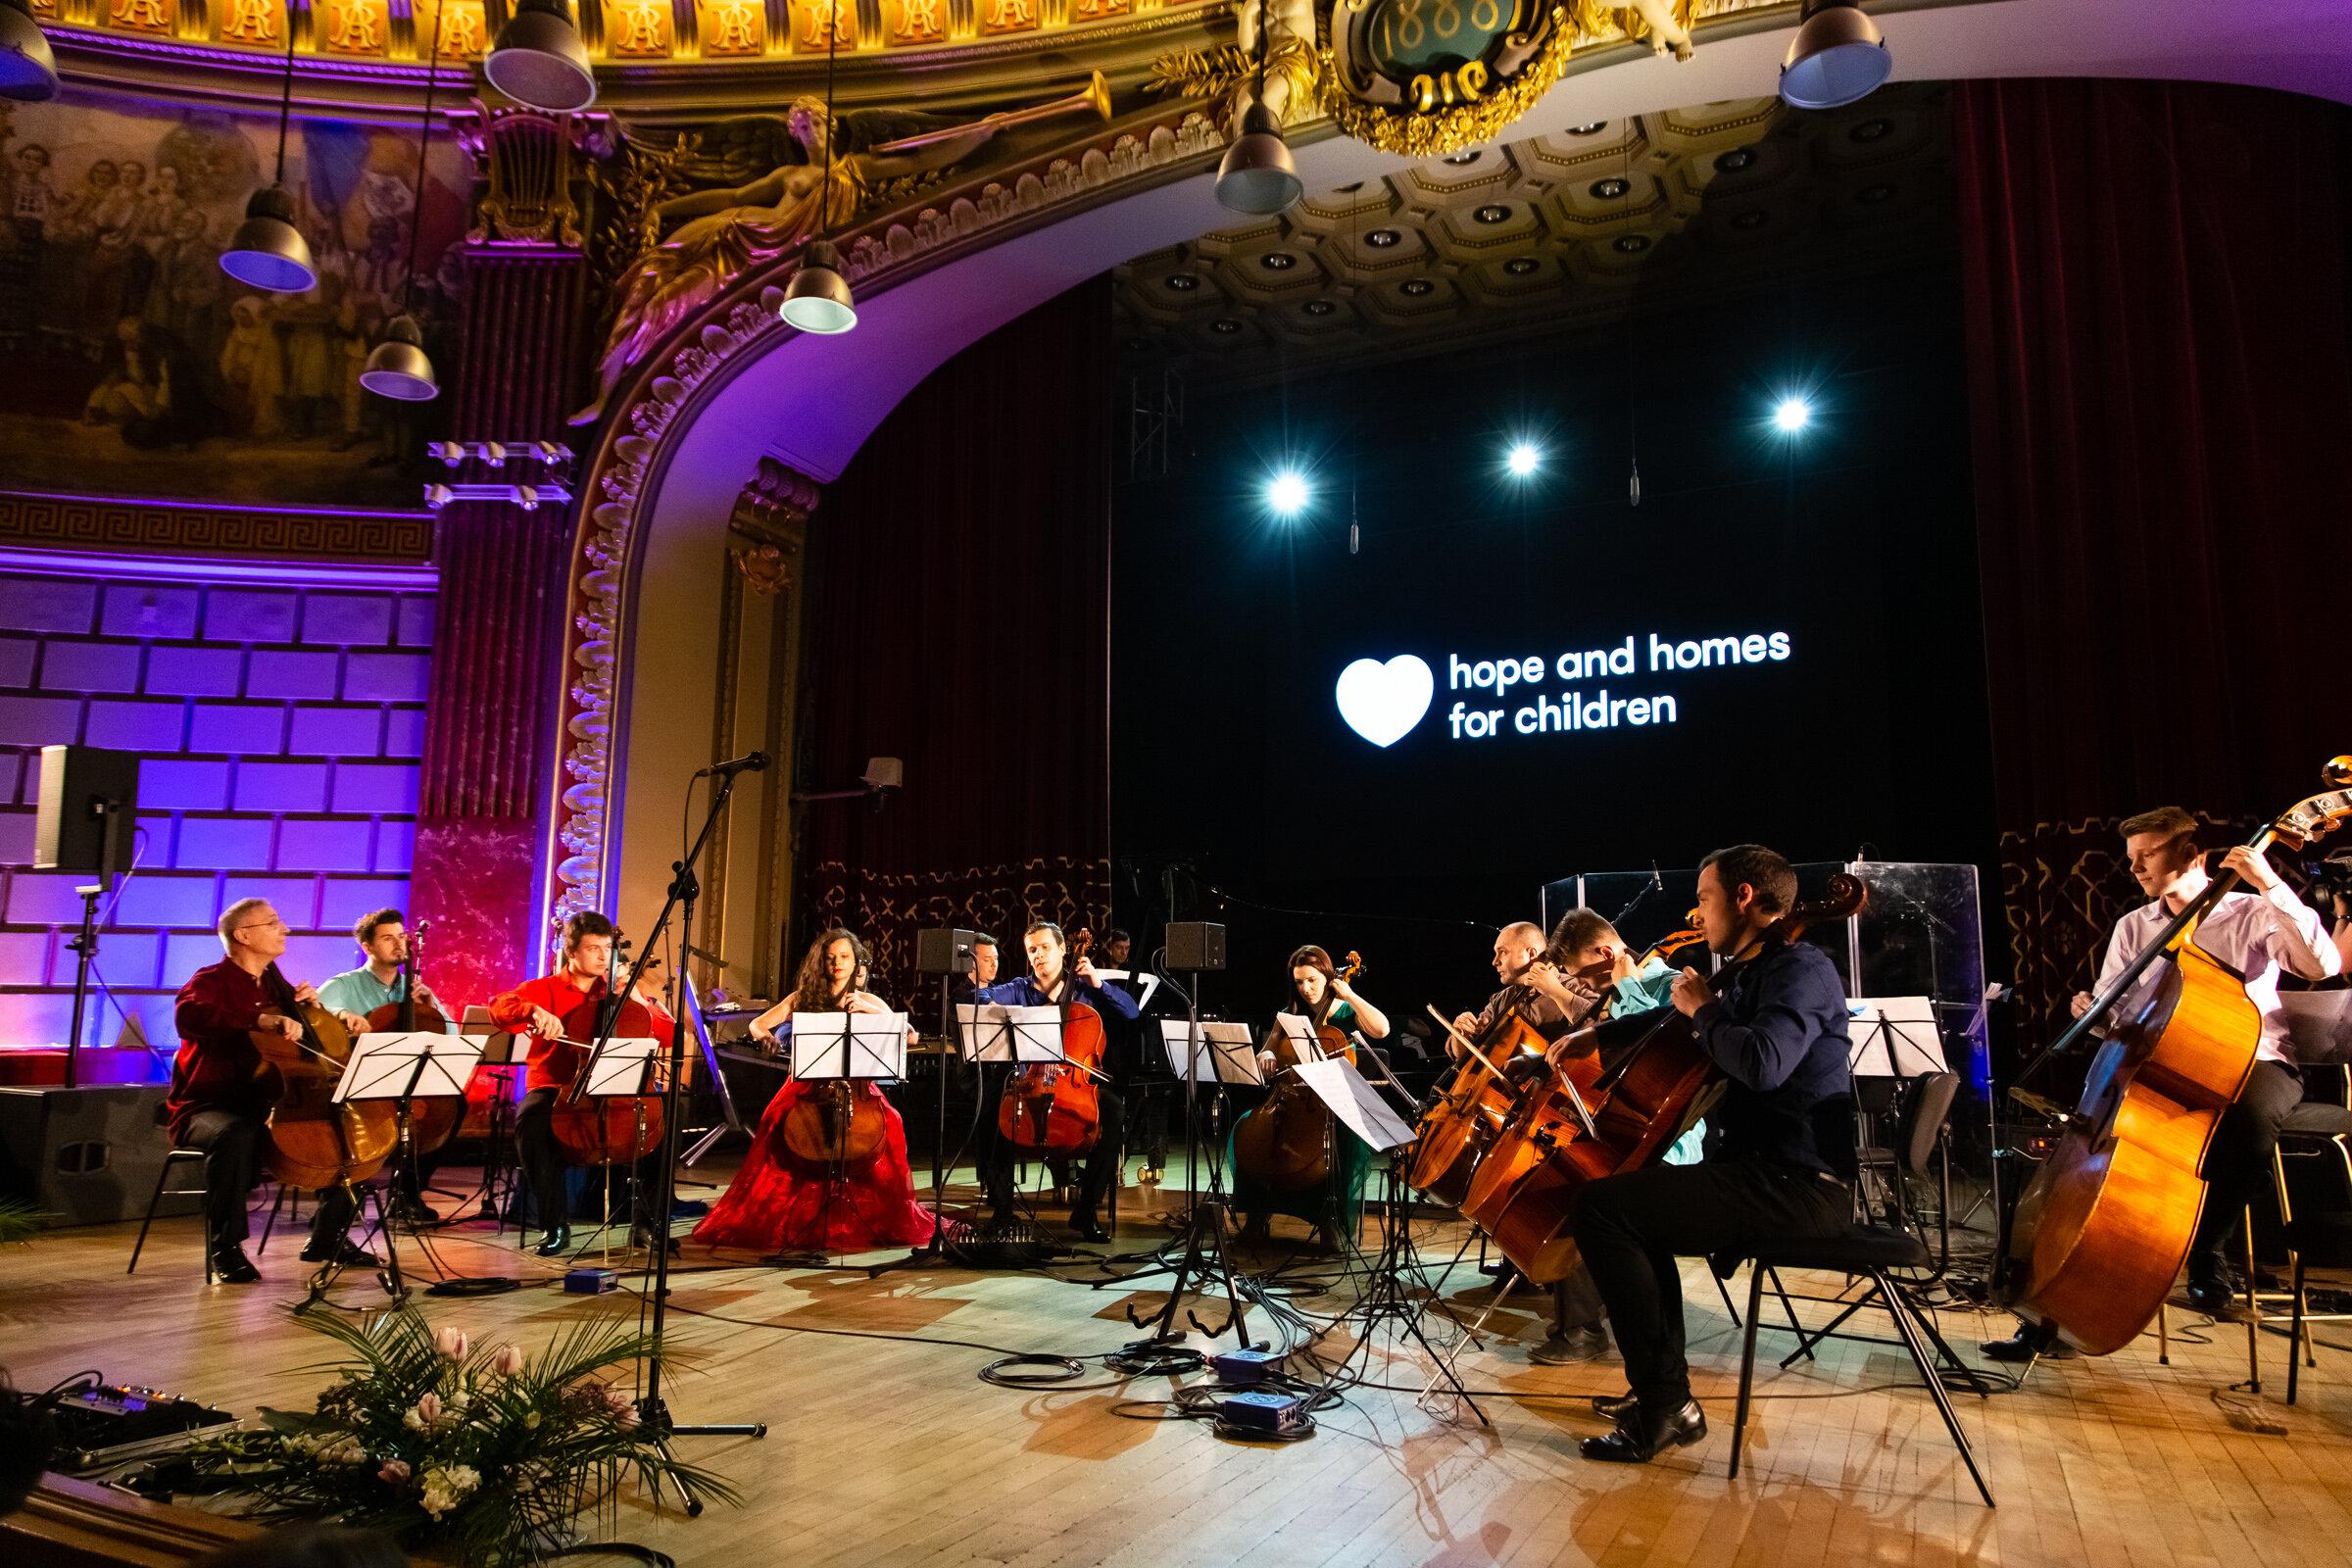 Ansamblul Violoncellissimo_Hope Concert 2019_03_Foto Mihnea Ciulei.jpg